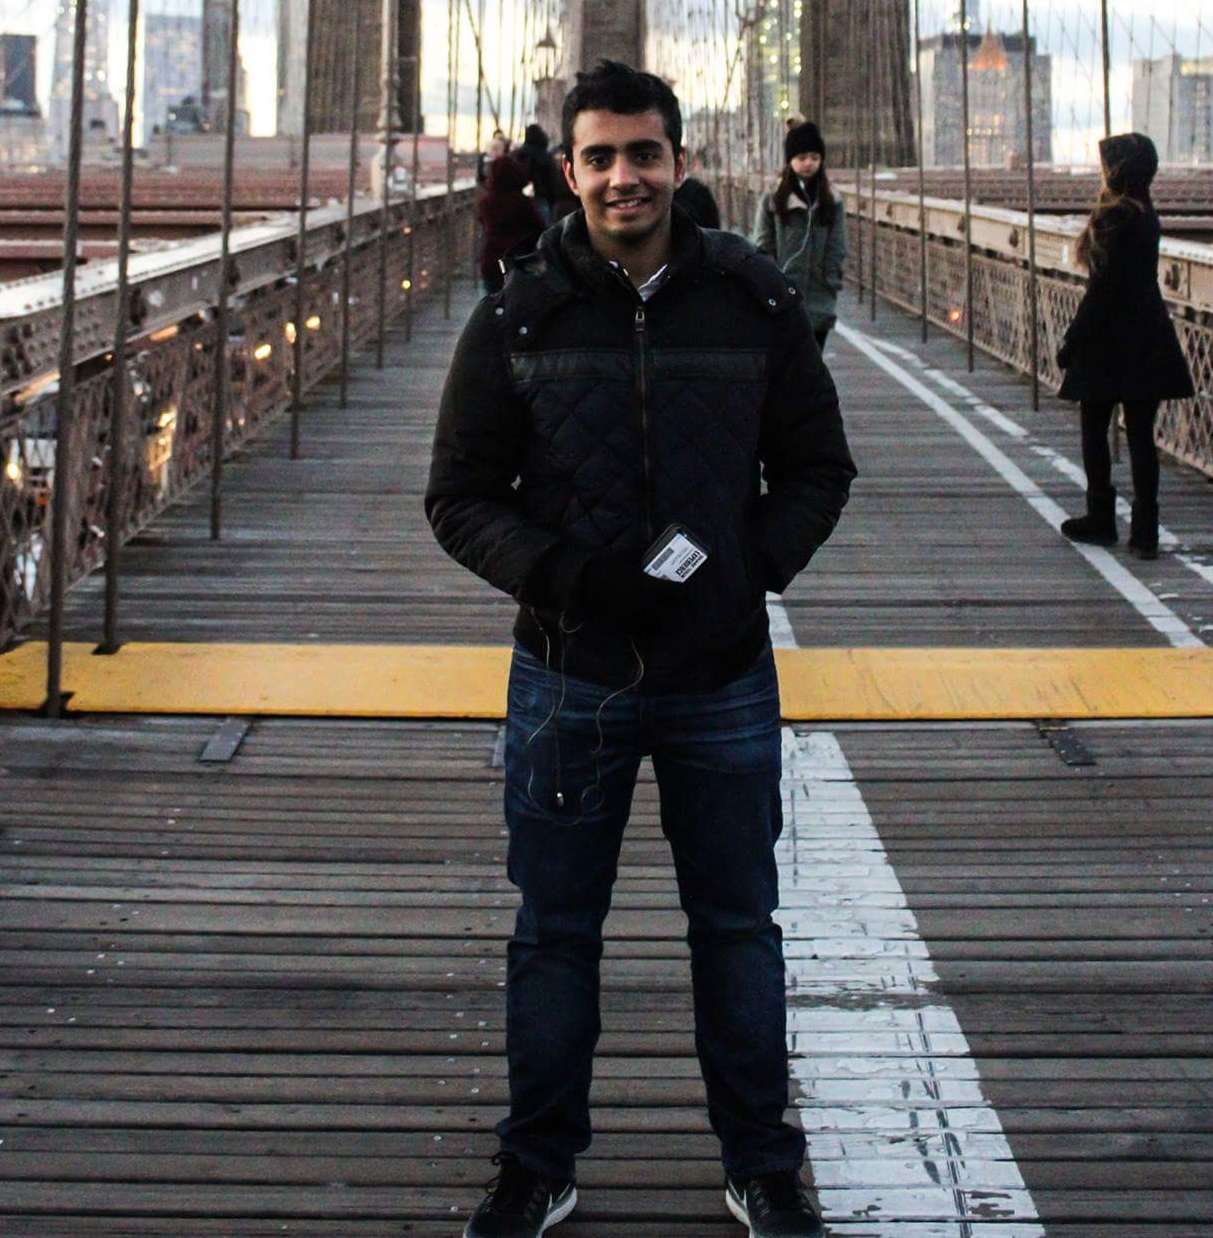 Angad daryani entrepreneur sharkit story interview